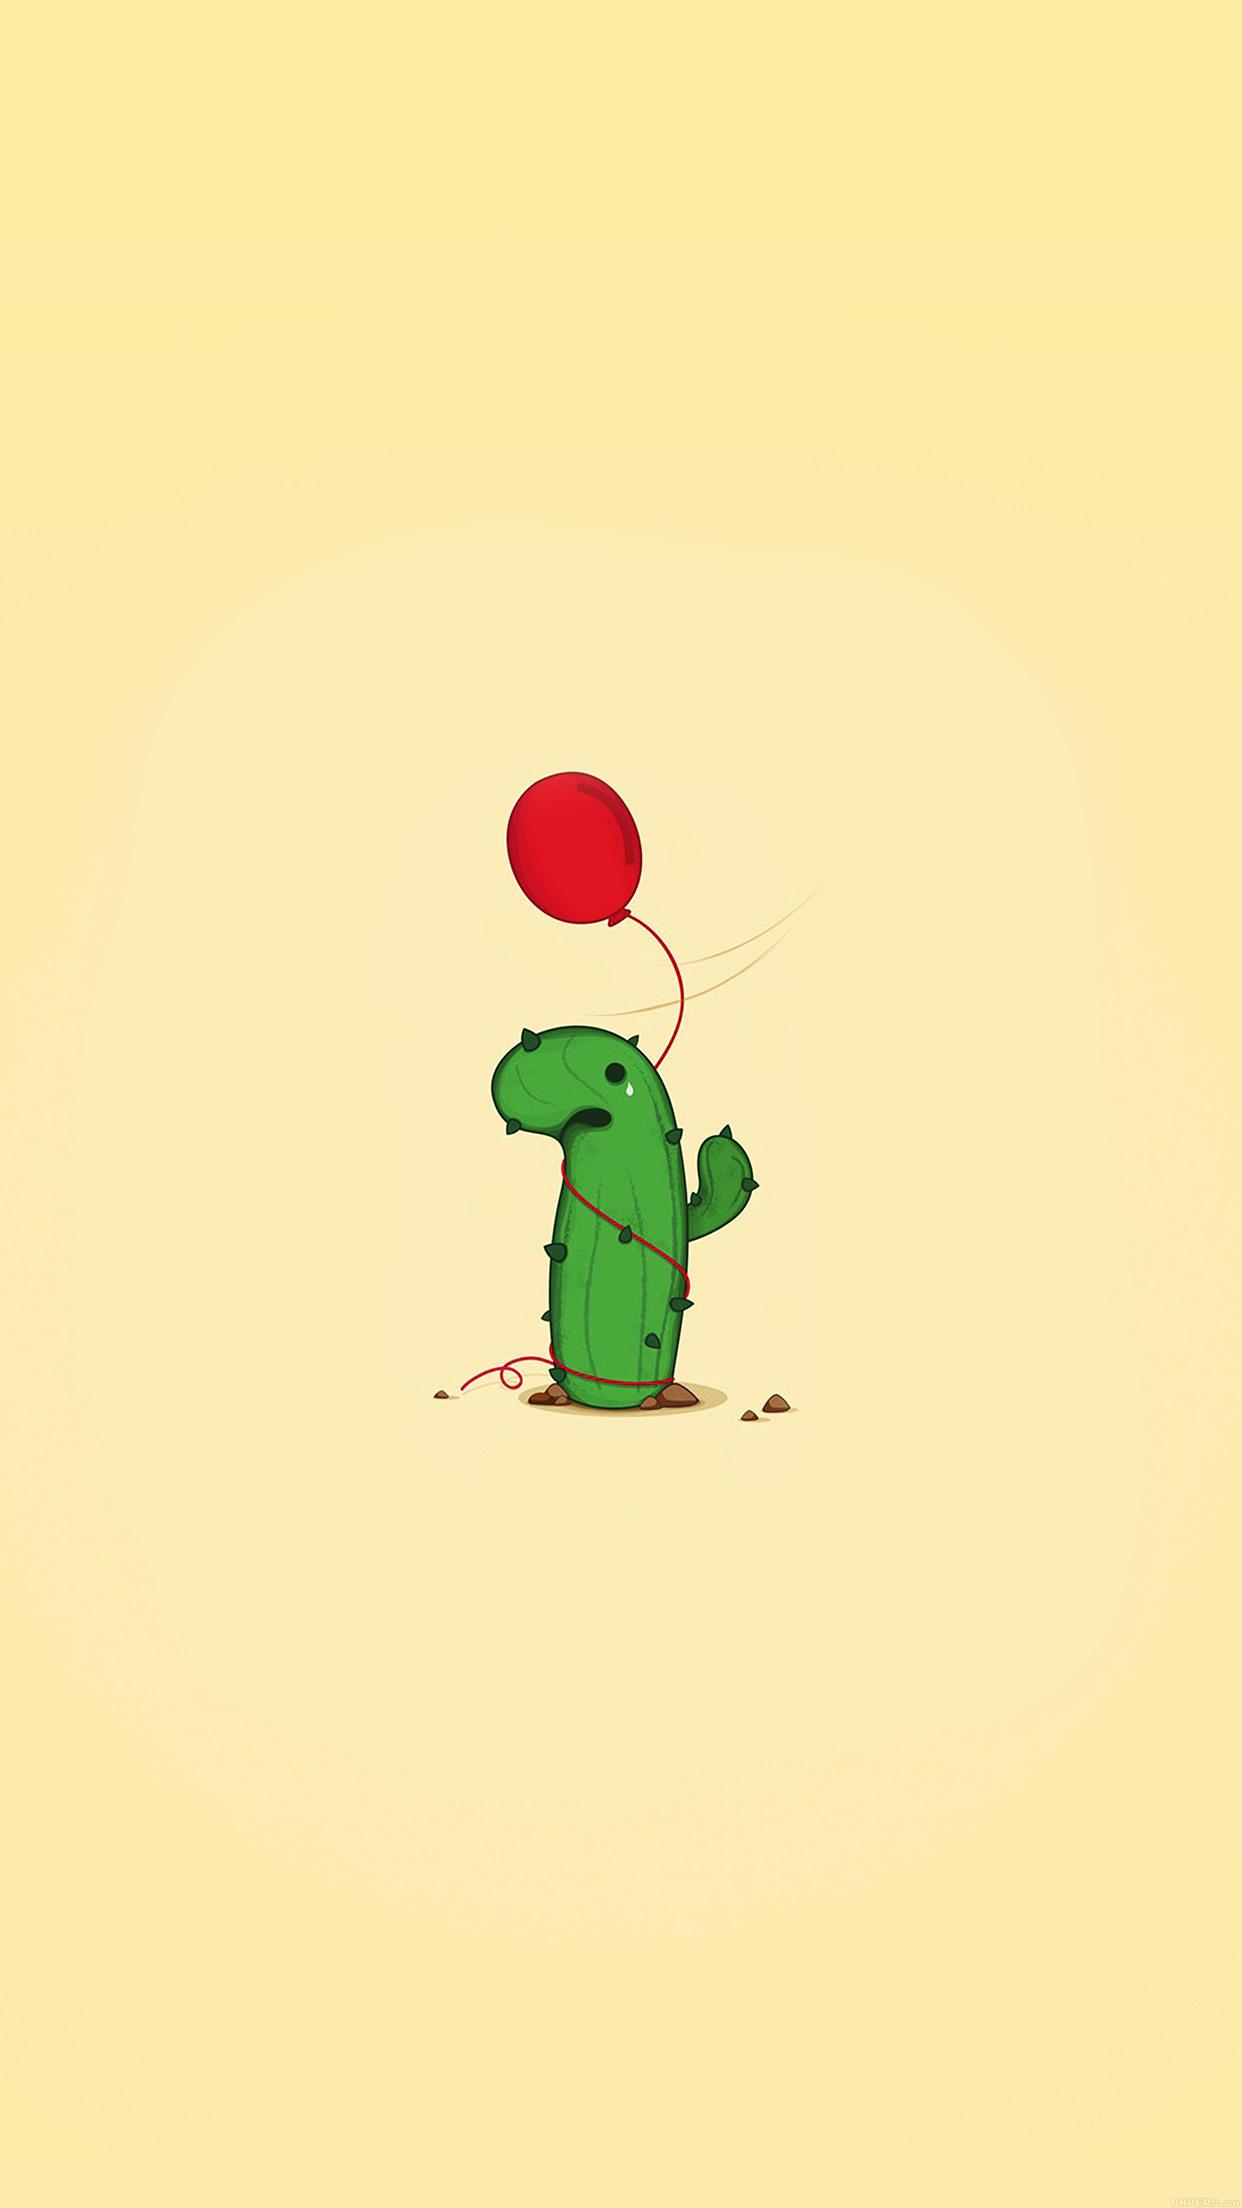 Cute Pickle Wallpaper Ai35 Cute Cactus Ballon Illust Art Minimal Papers Co